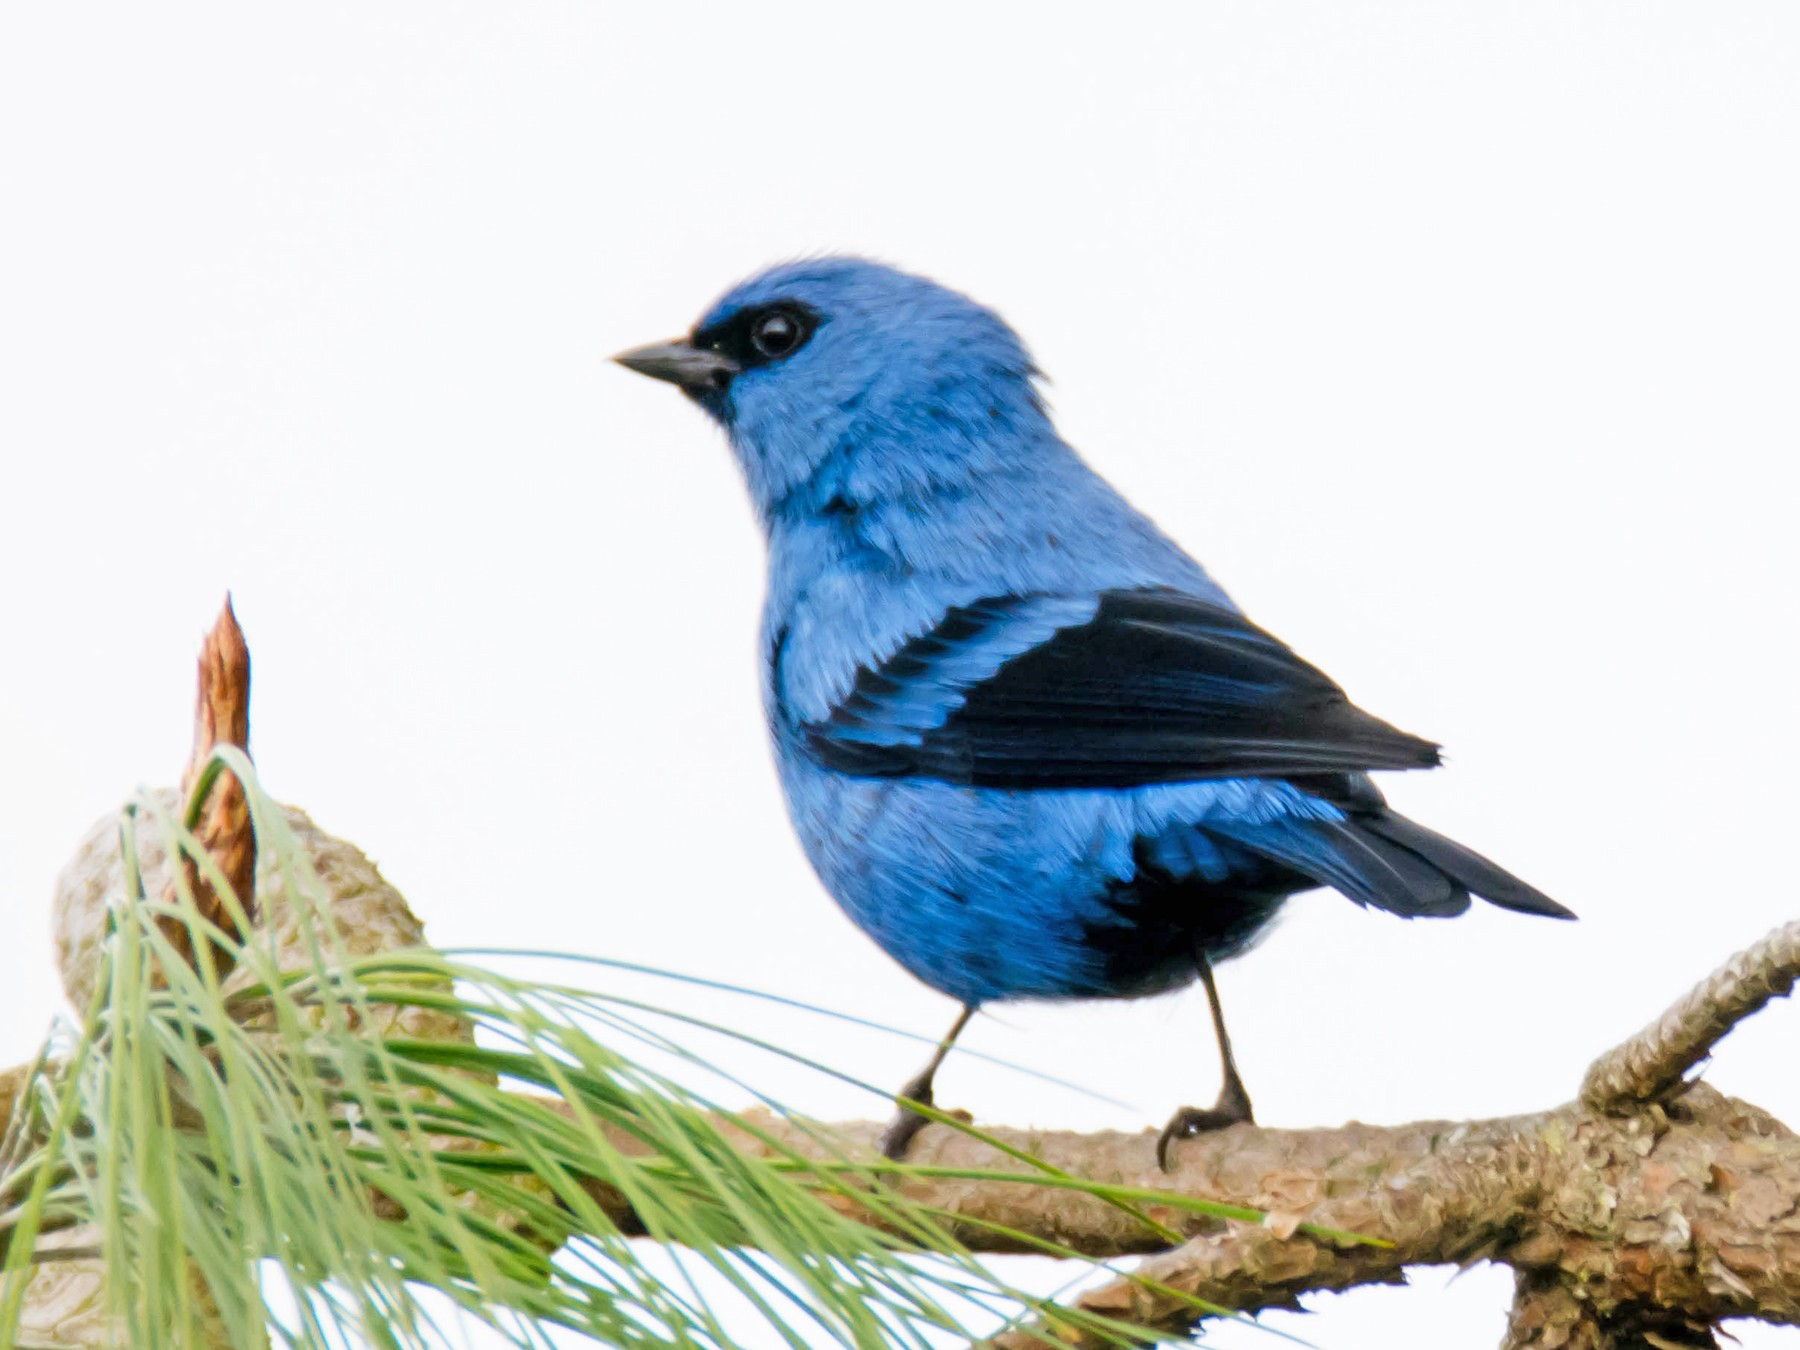 Blue-and-black Tanager - Juan Sebastian Moreno